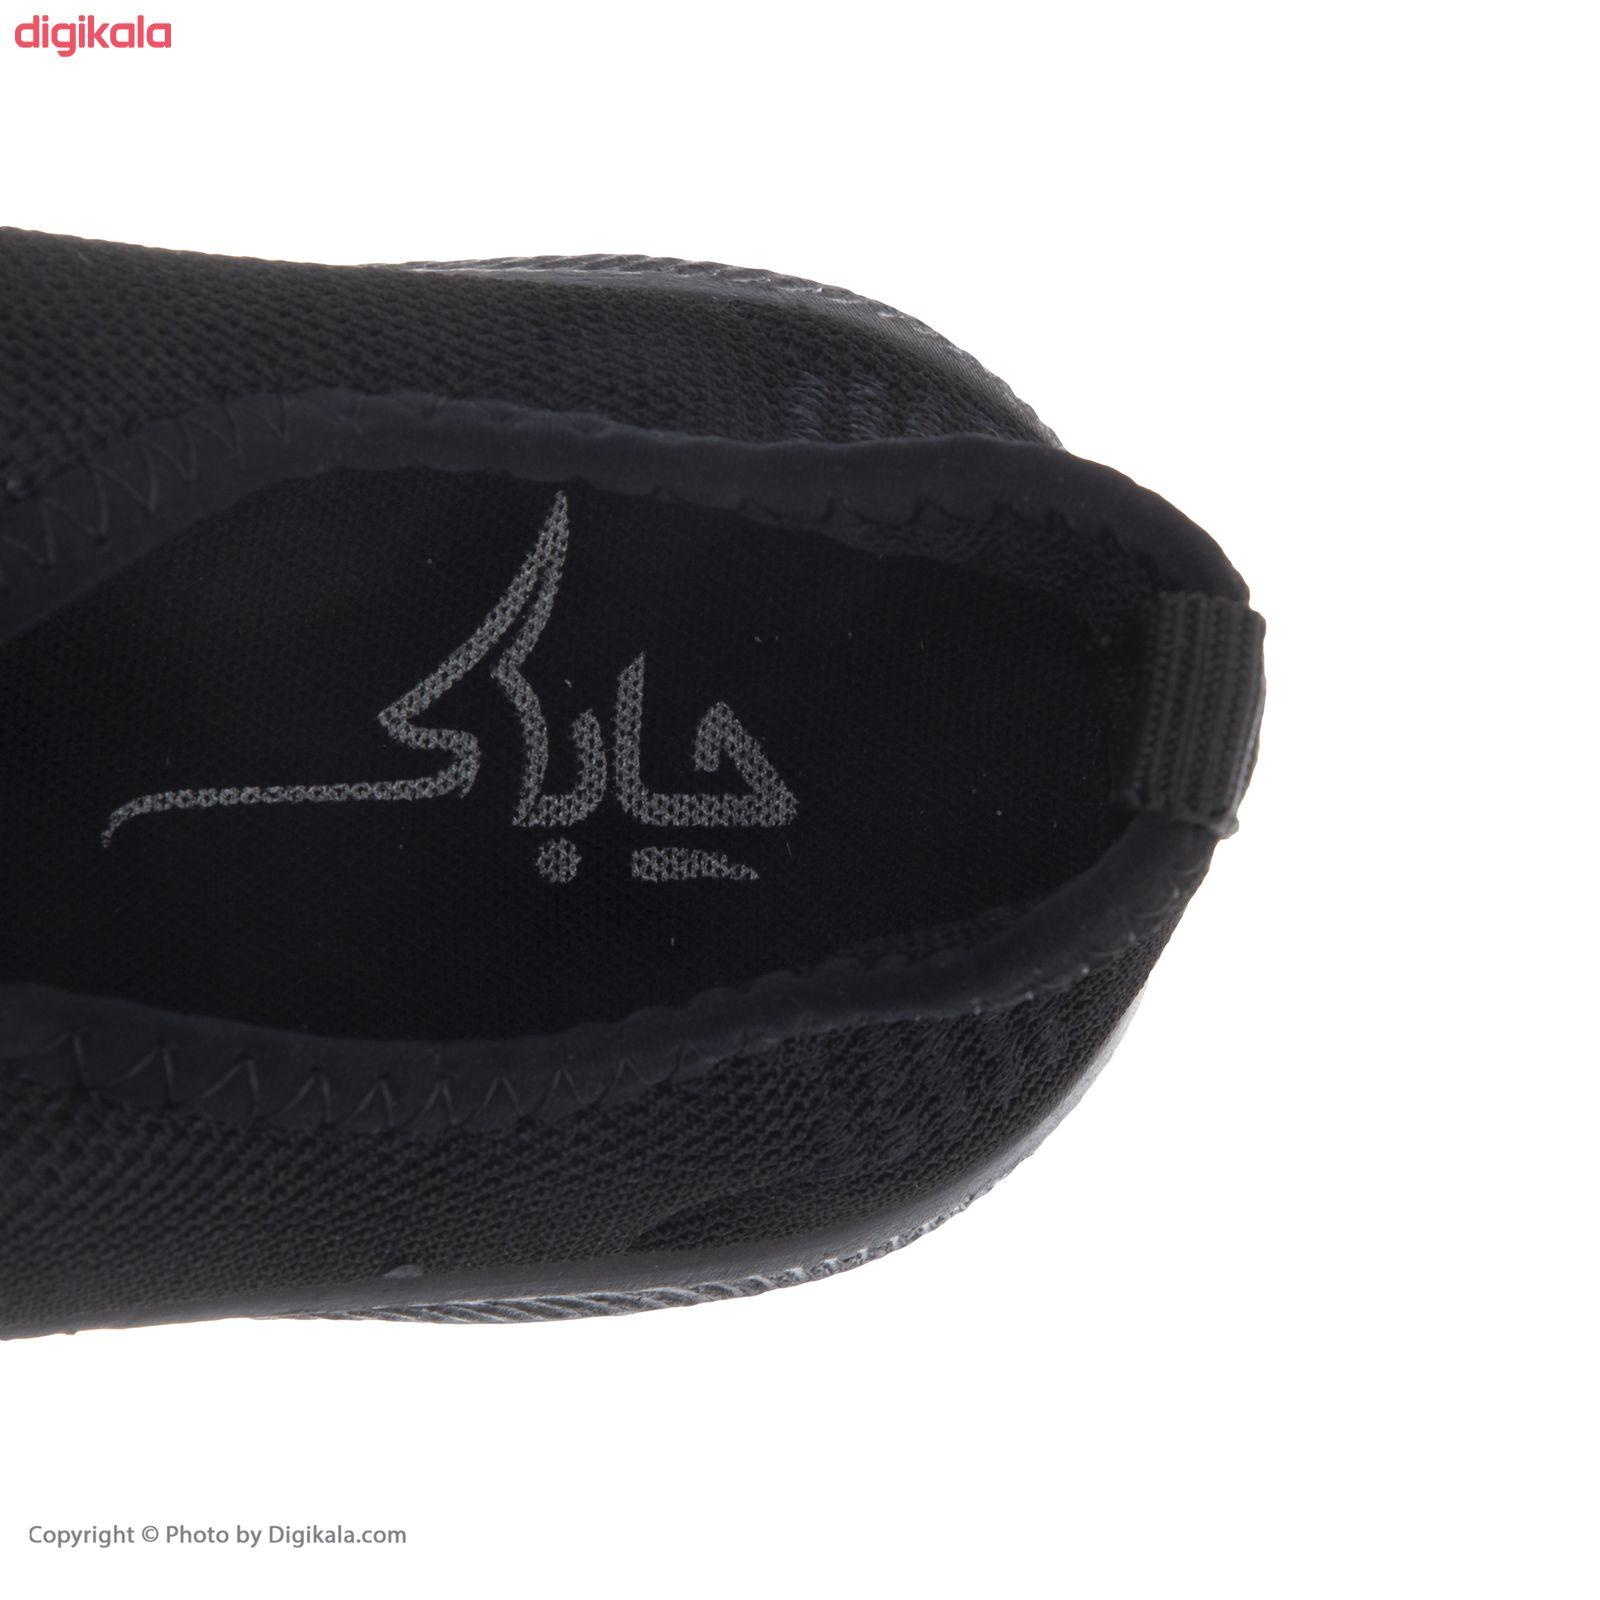 کفش راحتی چابک مدل آرشام رنگ مشکی main 1 5